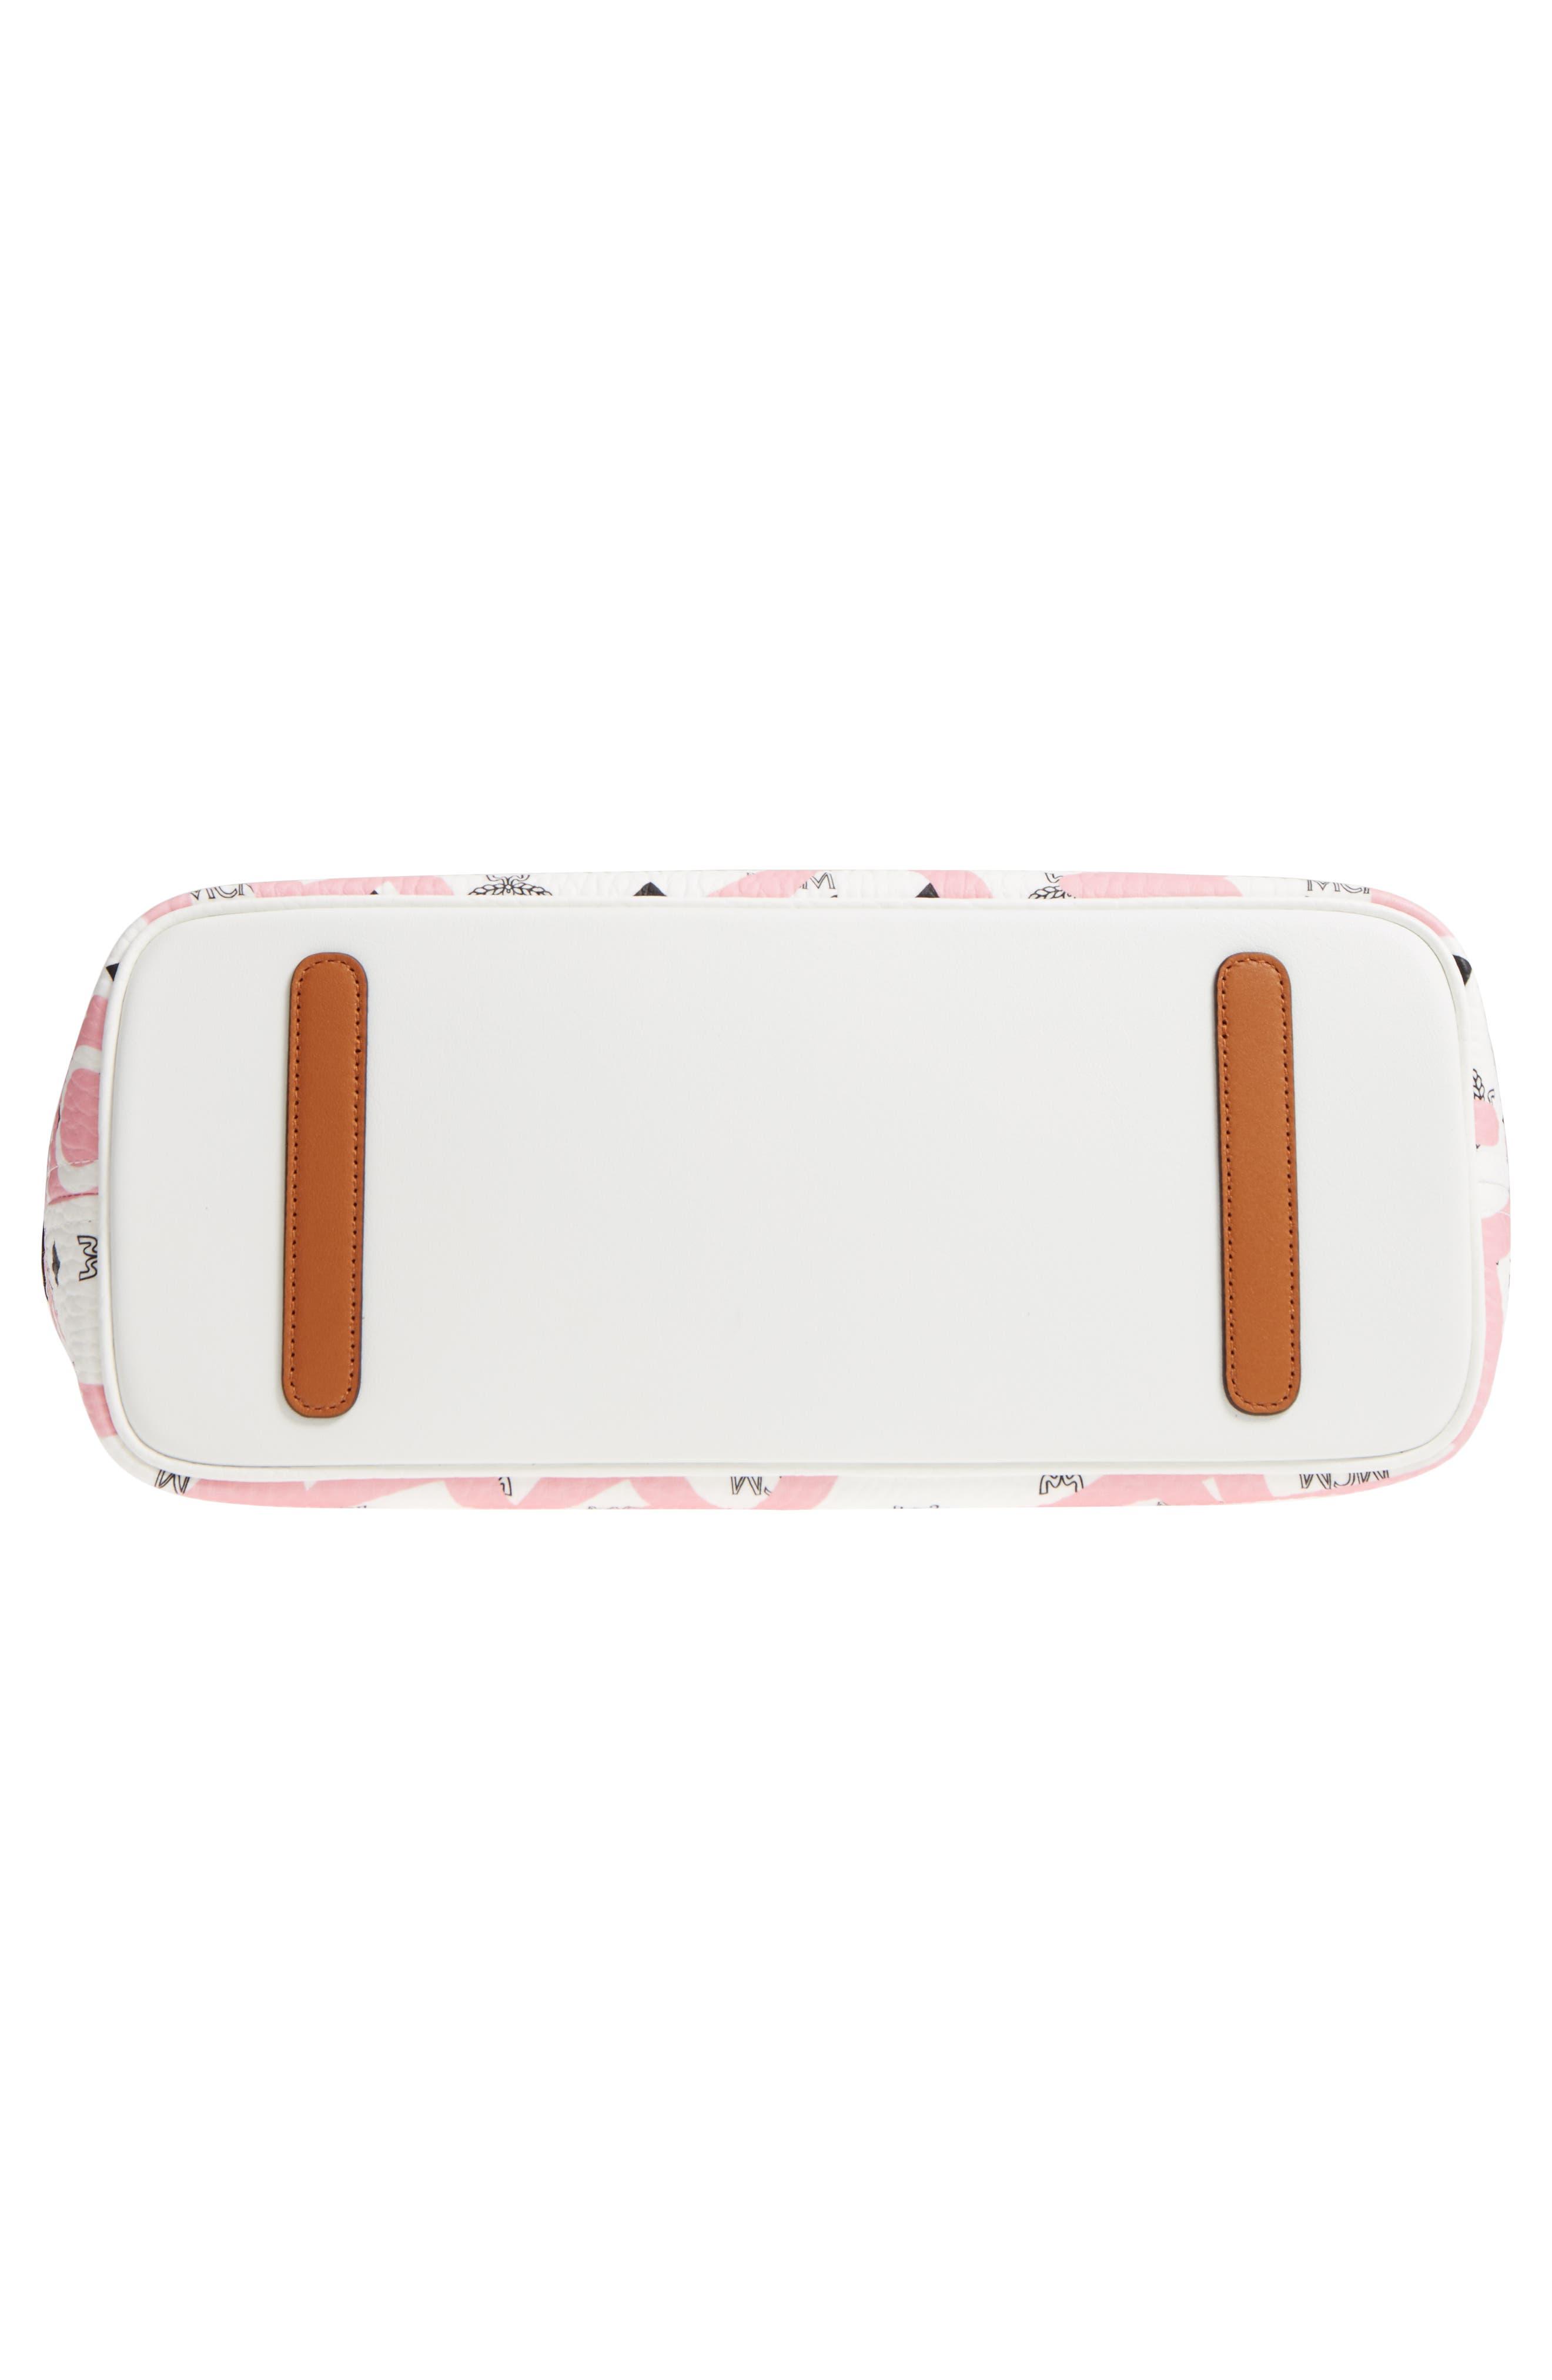 x Eddie Kang Medium Reversible Coated Canvas Shopper,                             Alternate thumbnail 6, color,                             White/ Pink